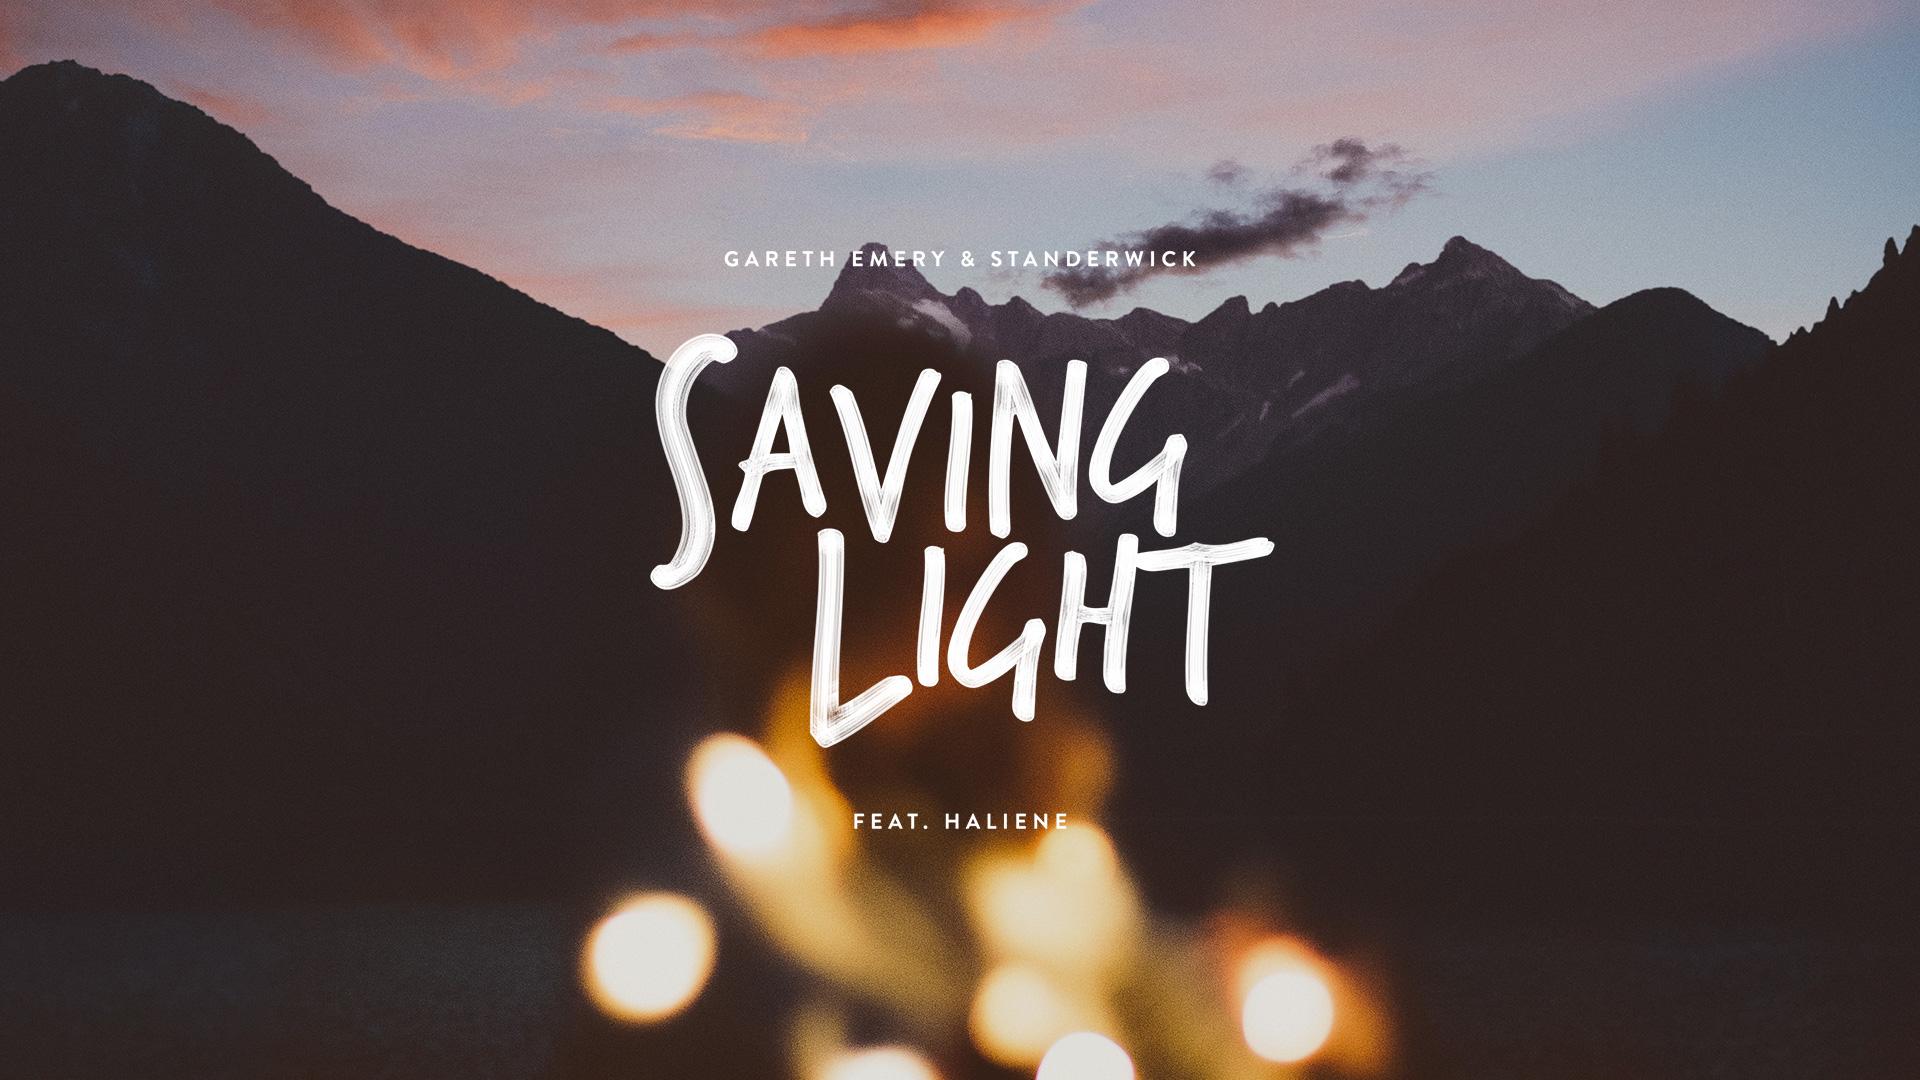 Wallpaper] Gareth Emery Standerwick   Saving Light feat 1920x1080